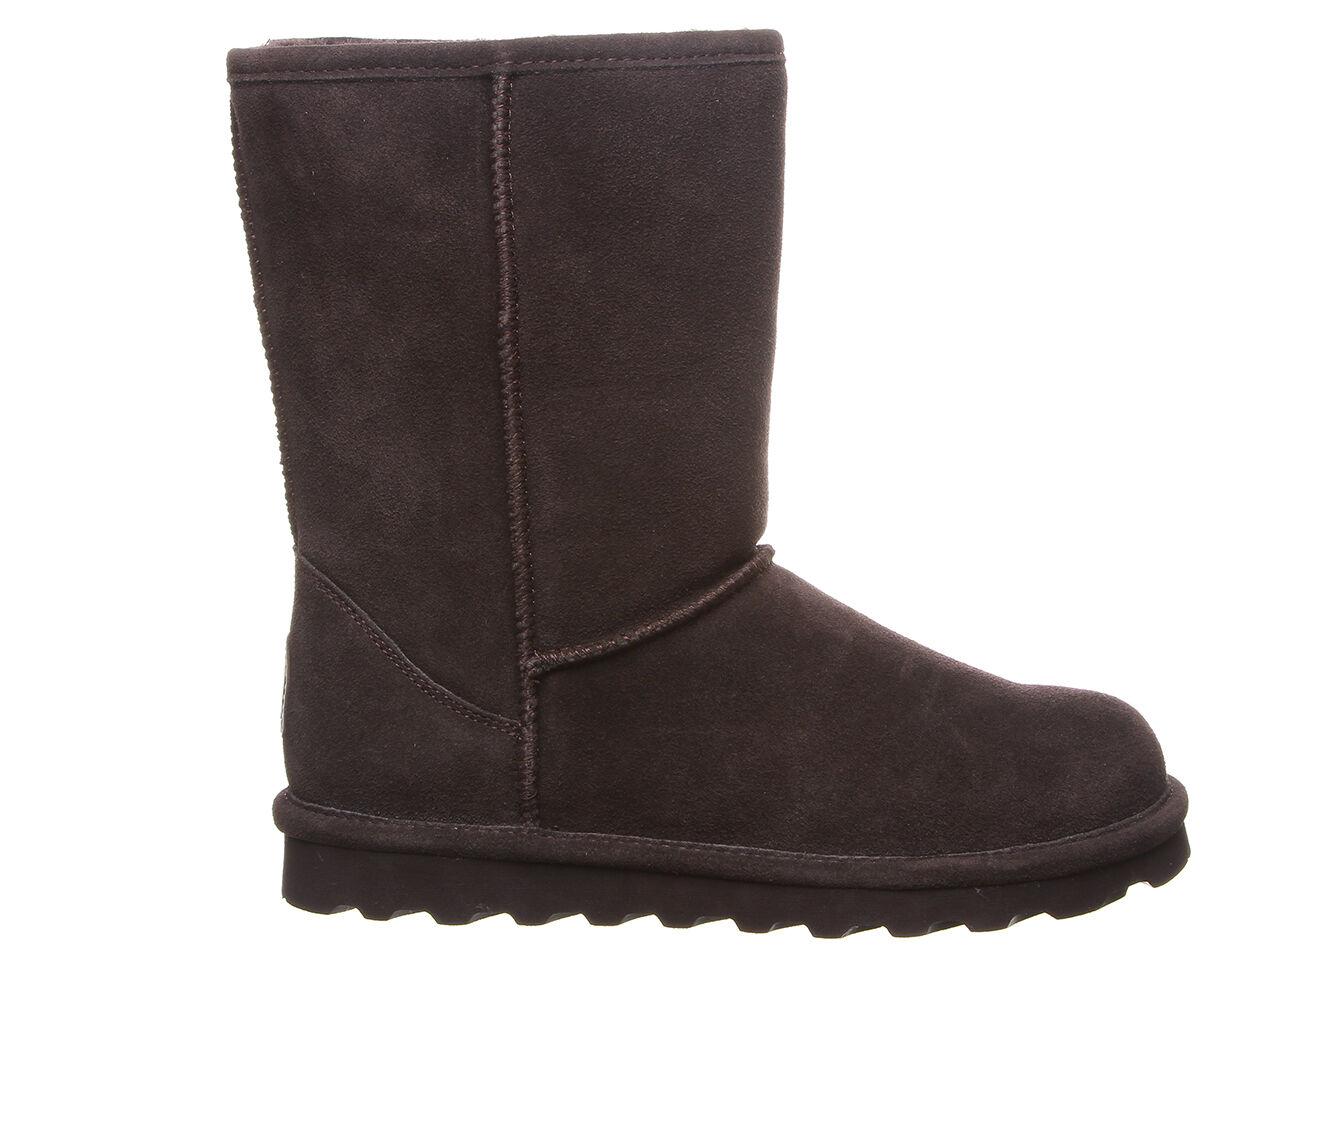 Women's Bearpaw Elle Short Wide Boots Chocolate